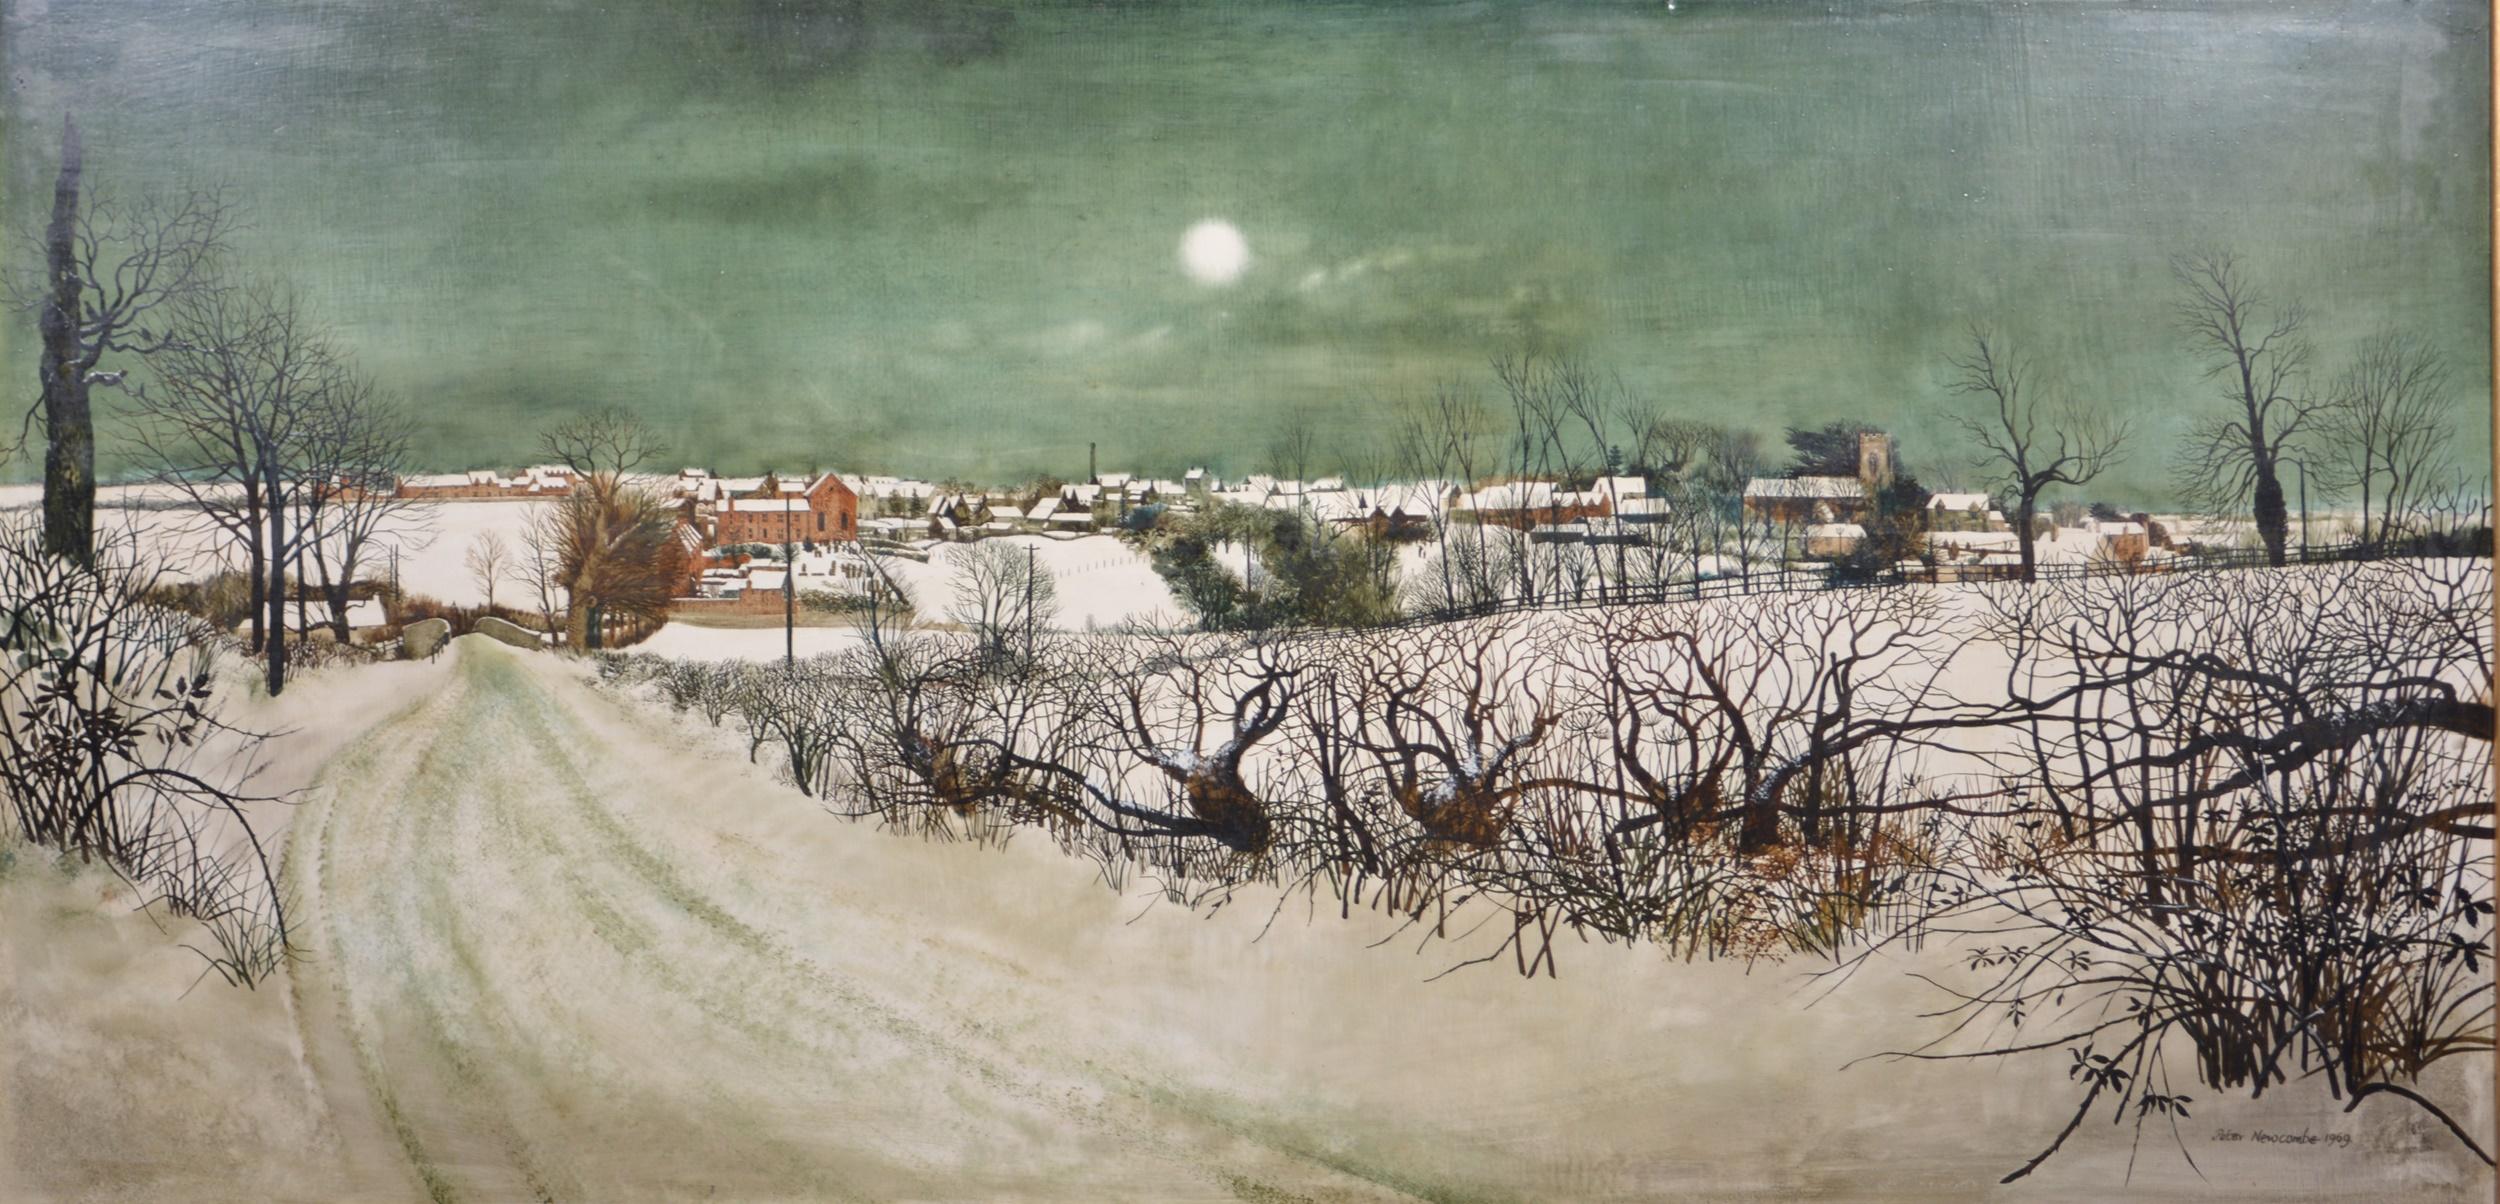 Peter Newcombe, Blisworth winter